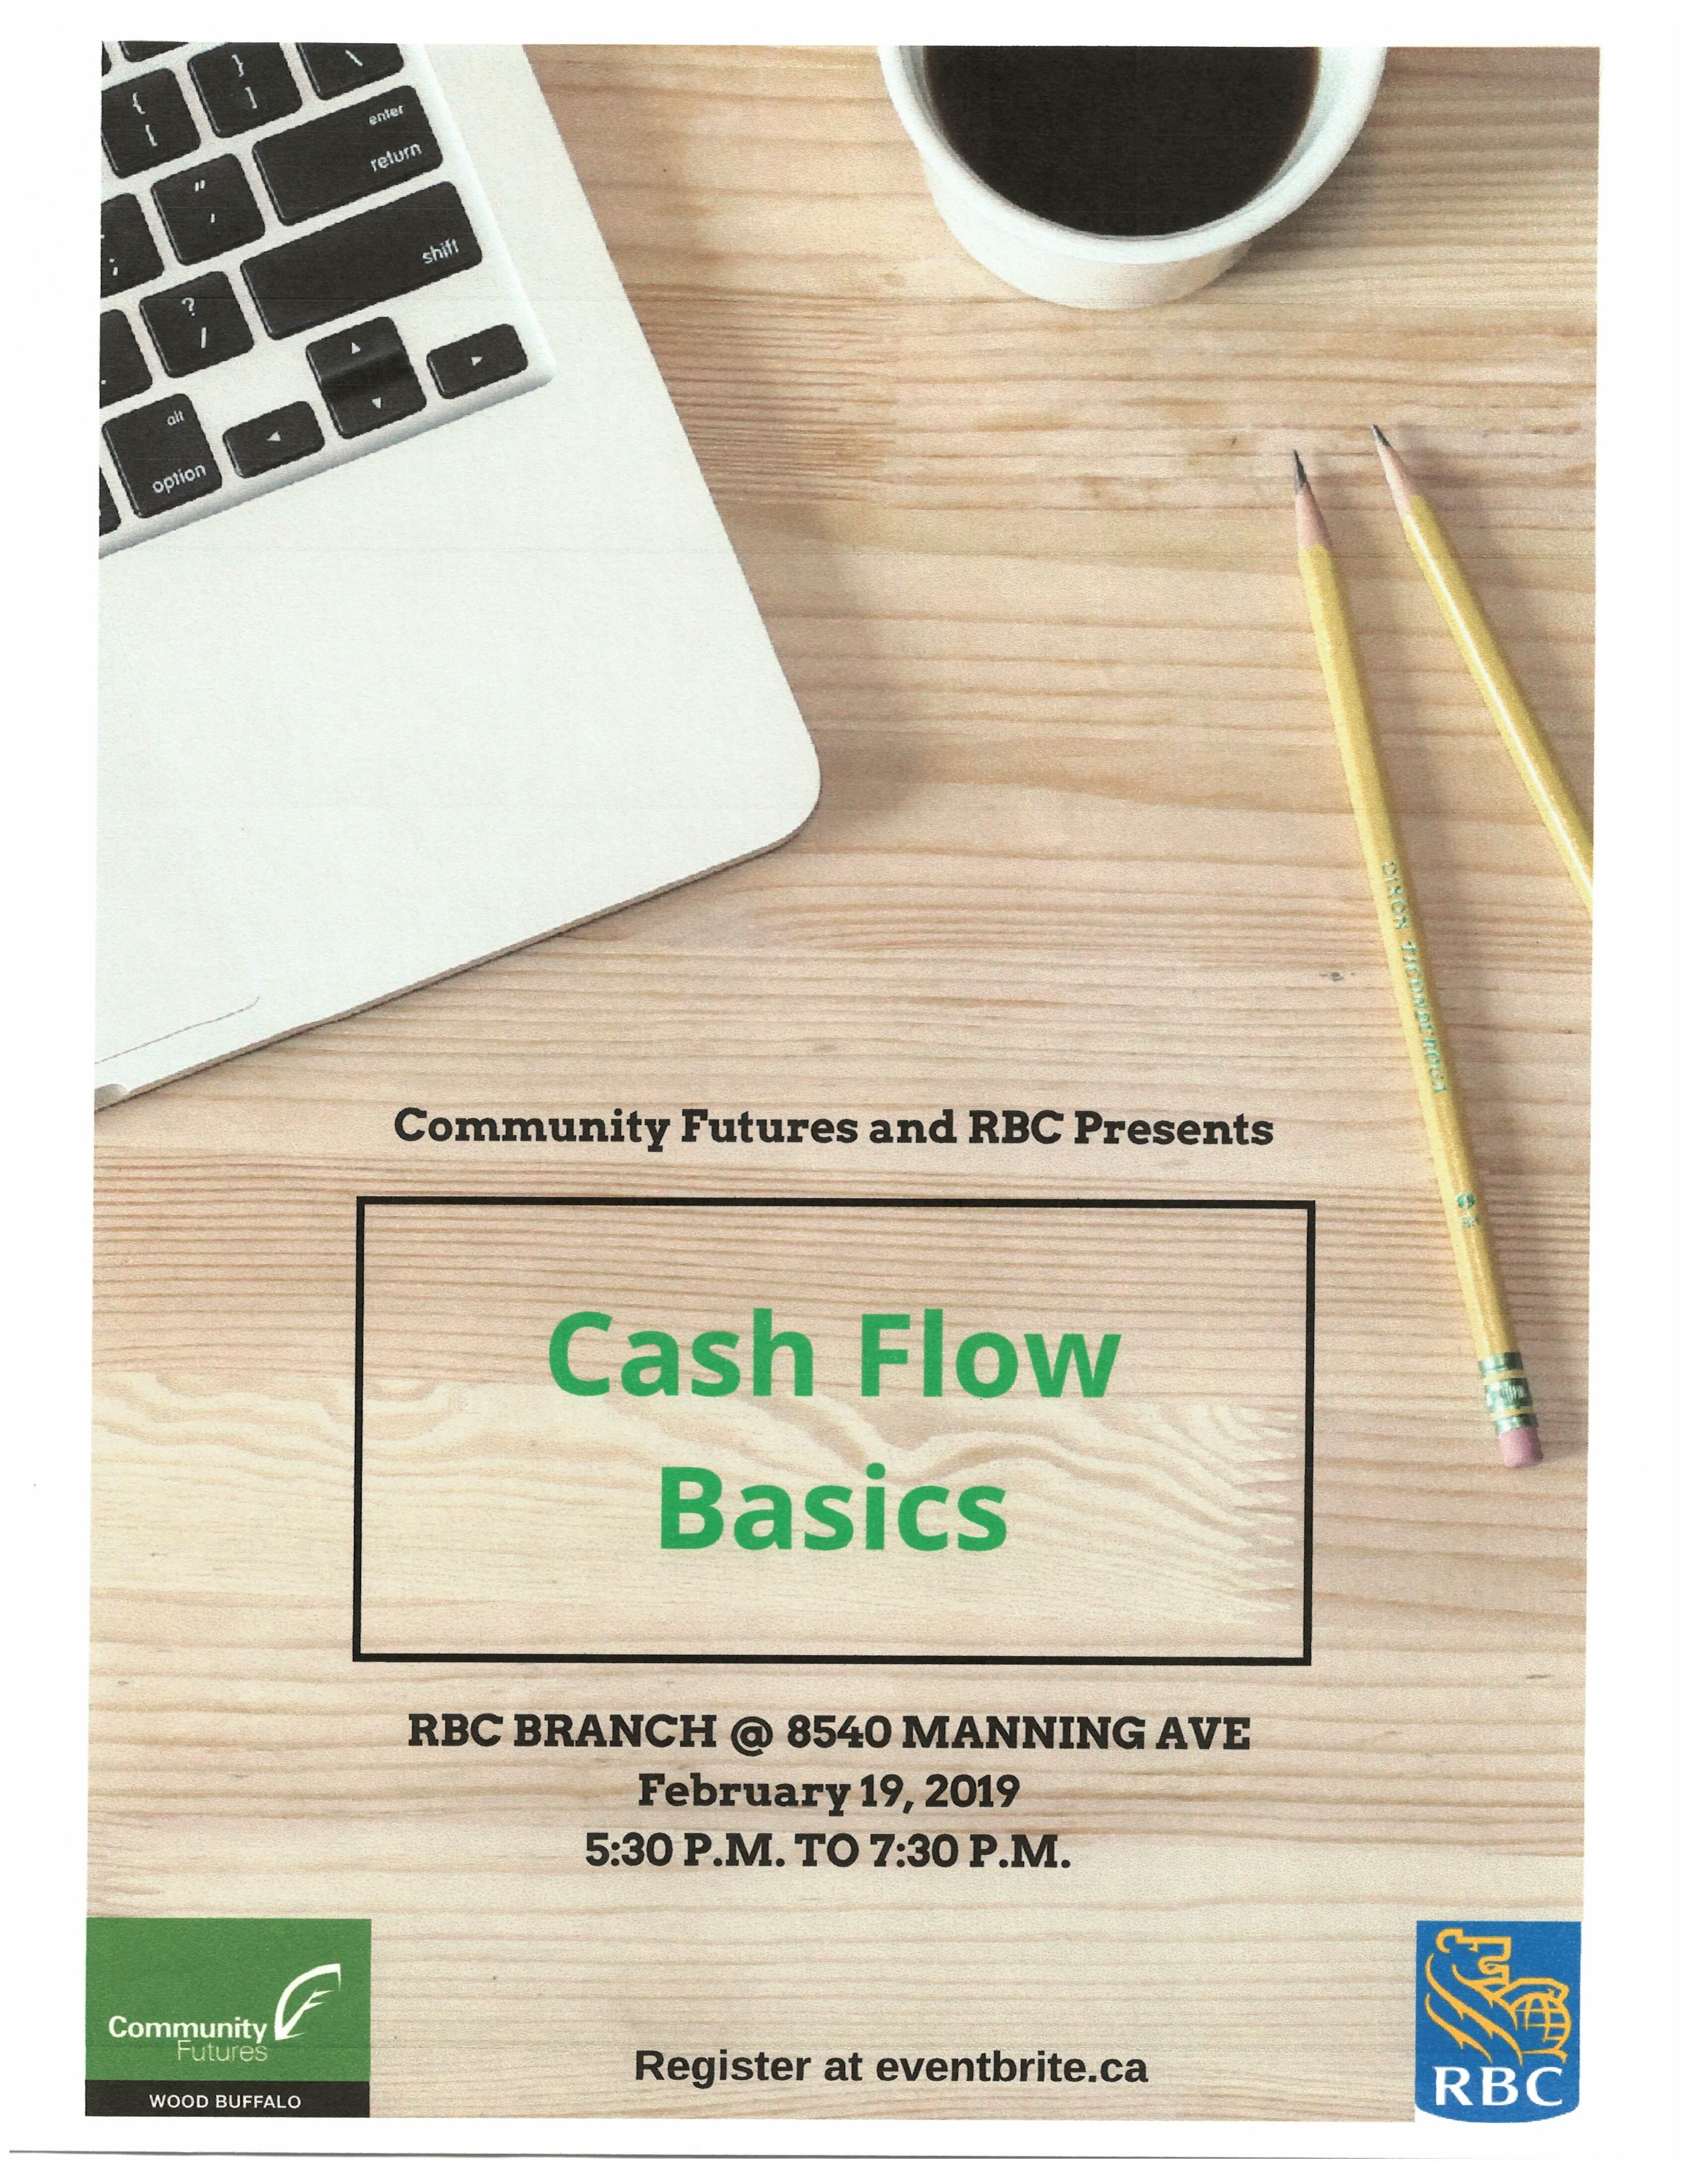 Business Cash Flow - Basics by MOHAMMED ALSOUFI RBC